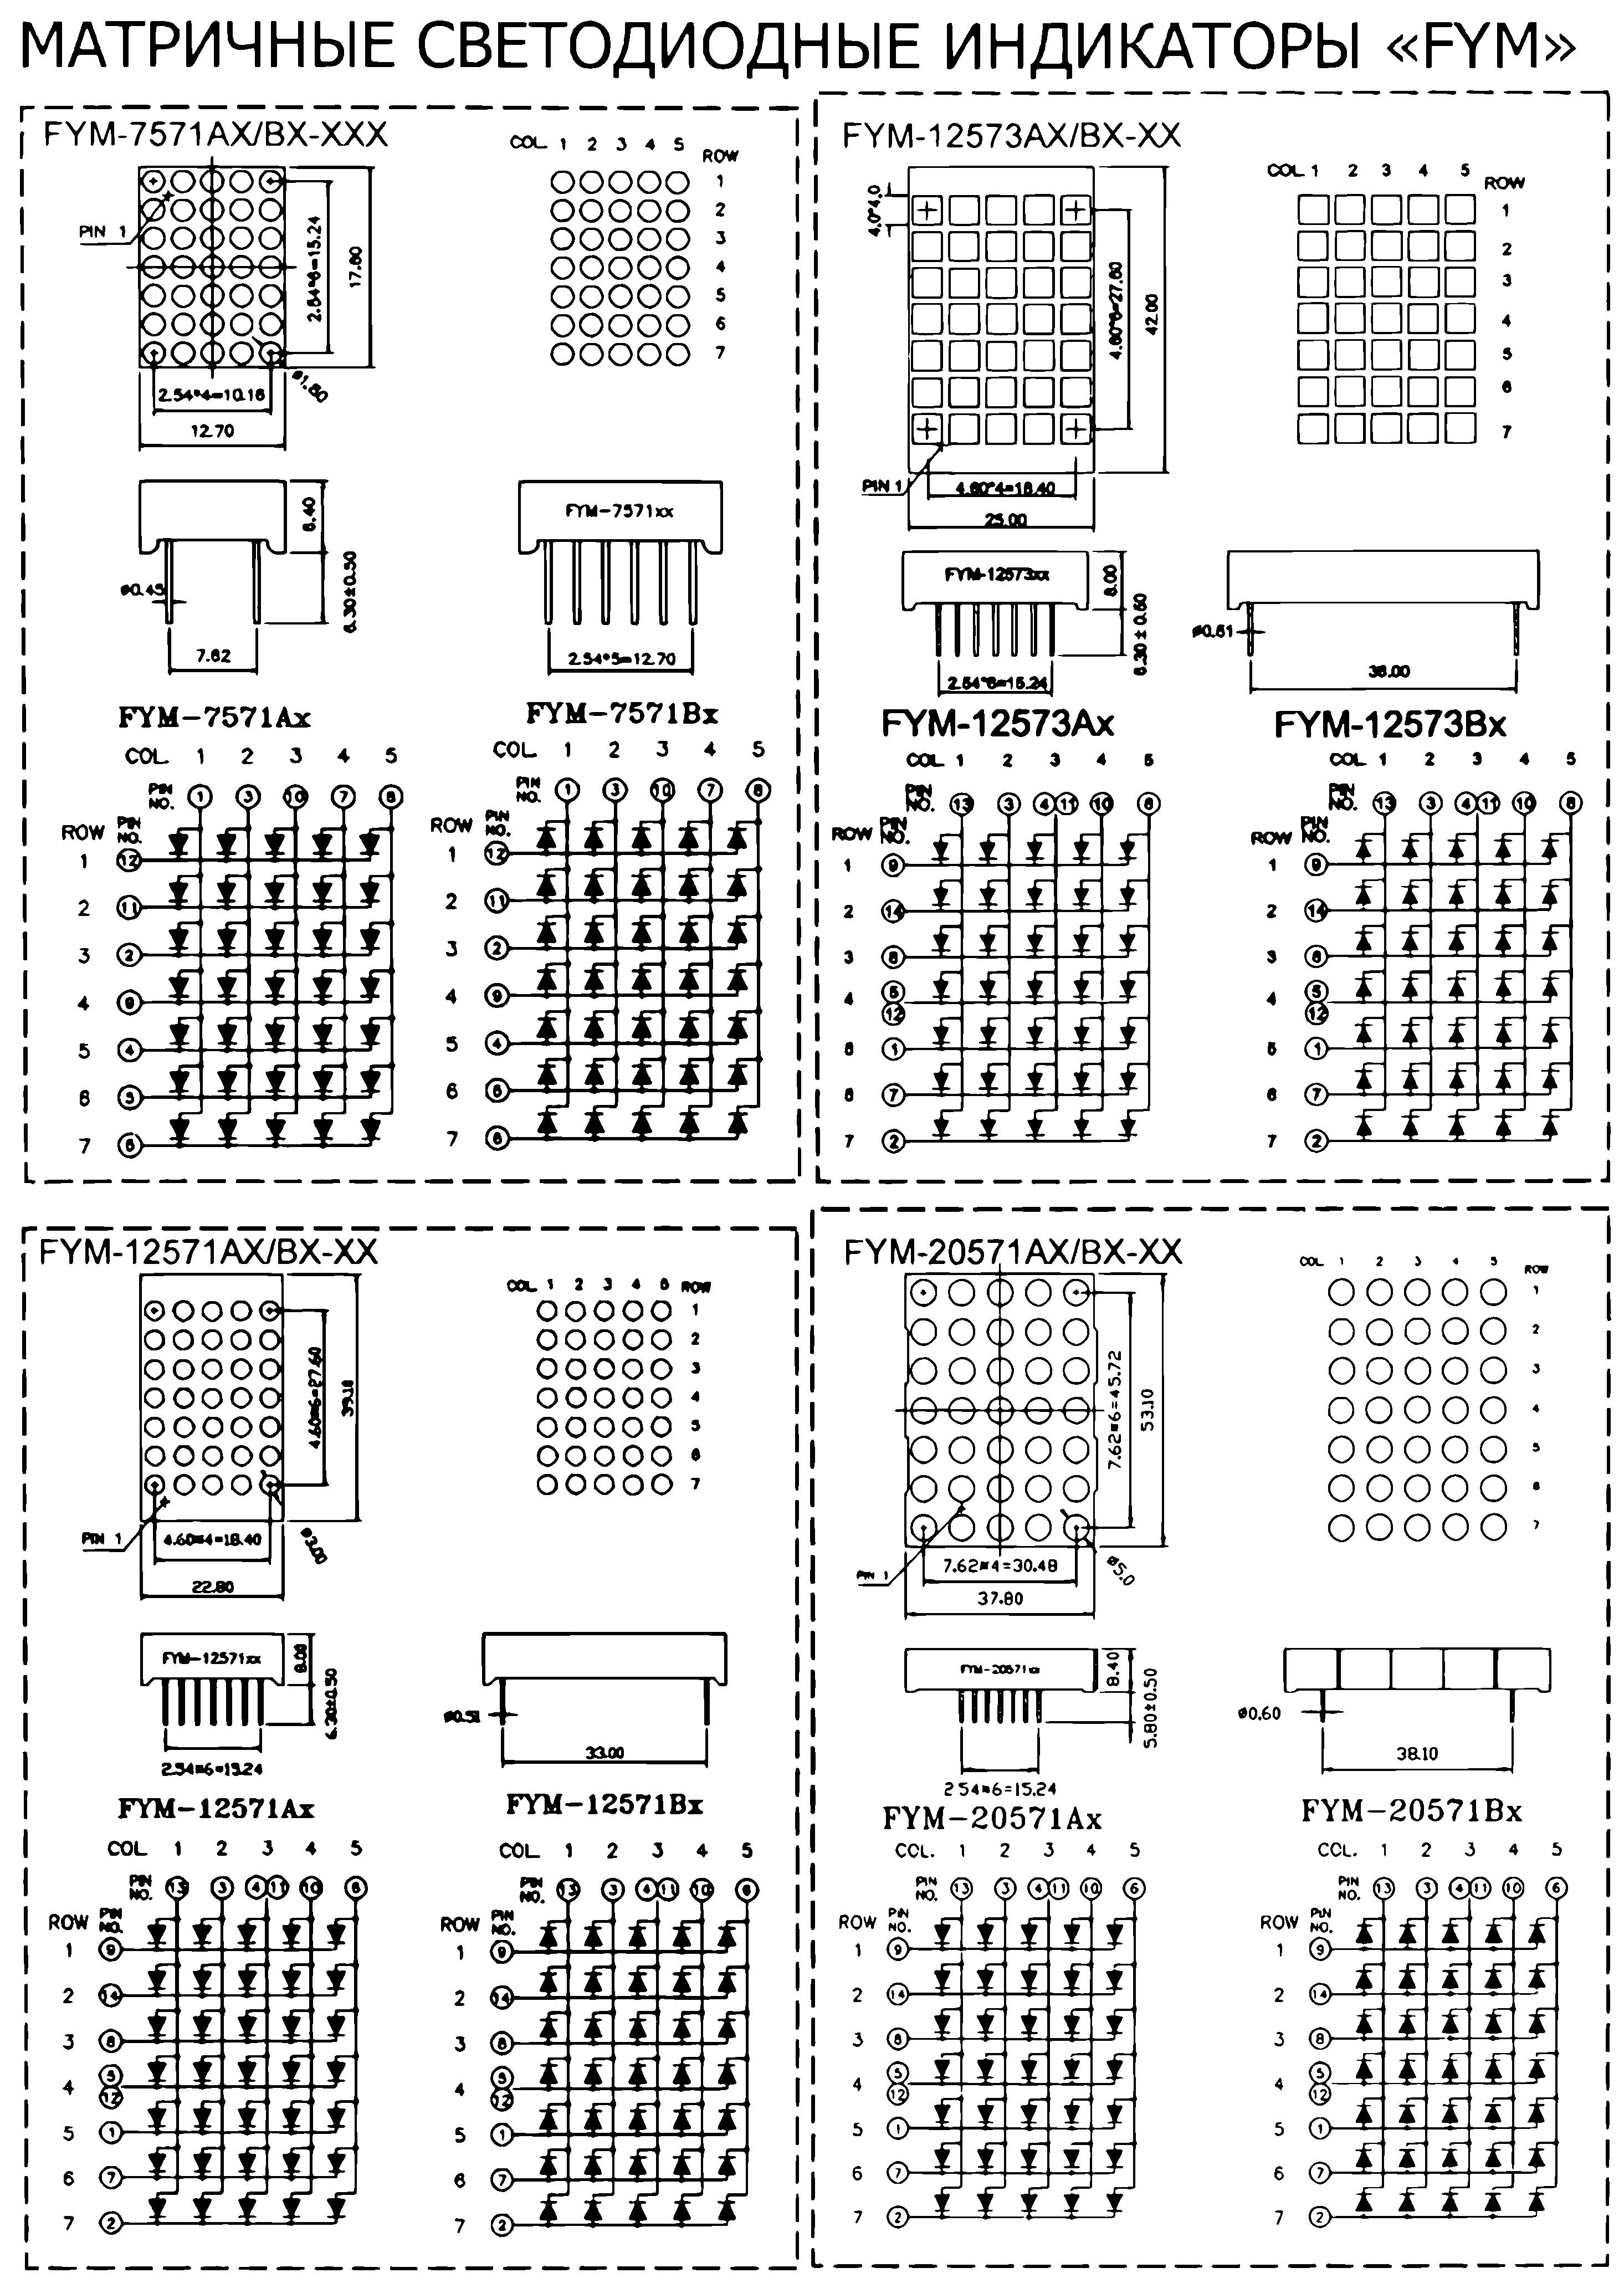 матричная схема светодиодов